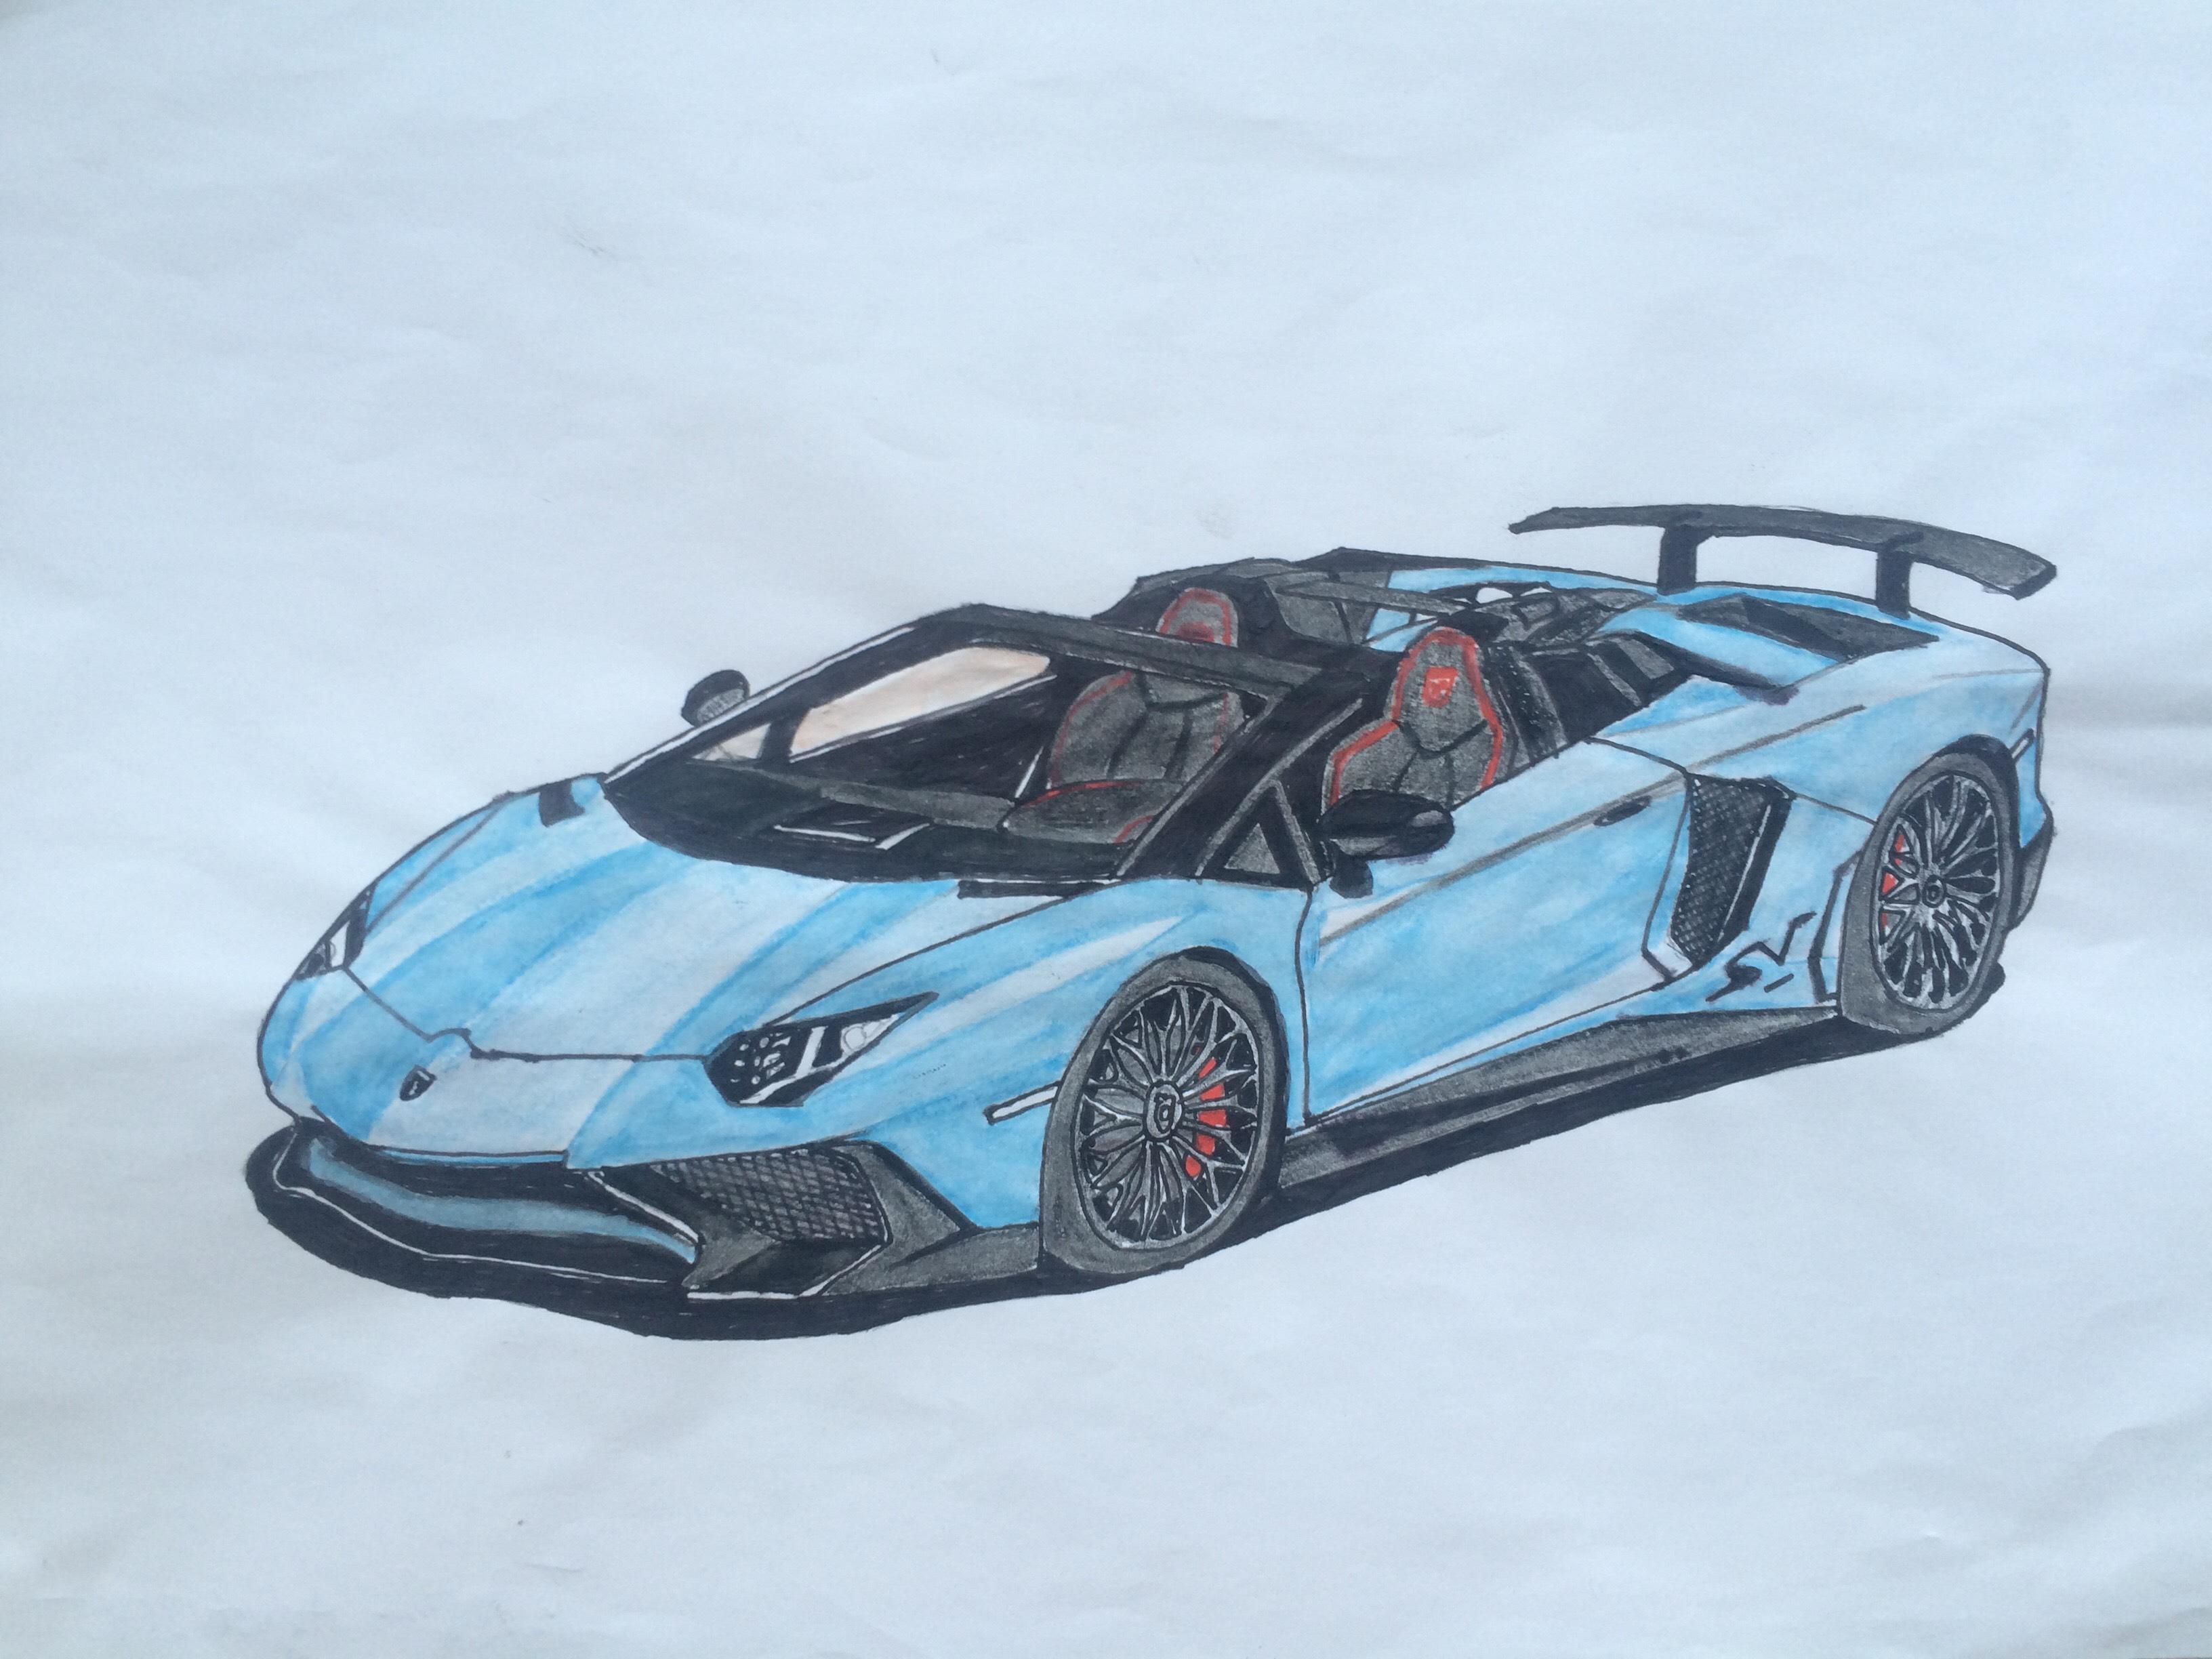 My drawing of the Lamborghini Aventador SV Roadster